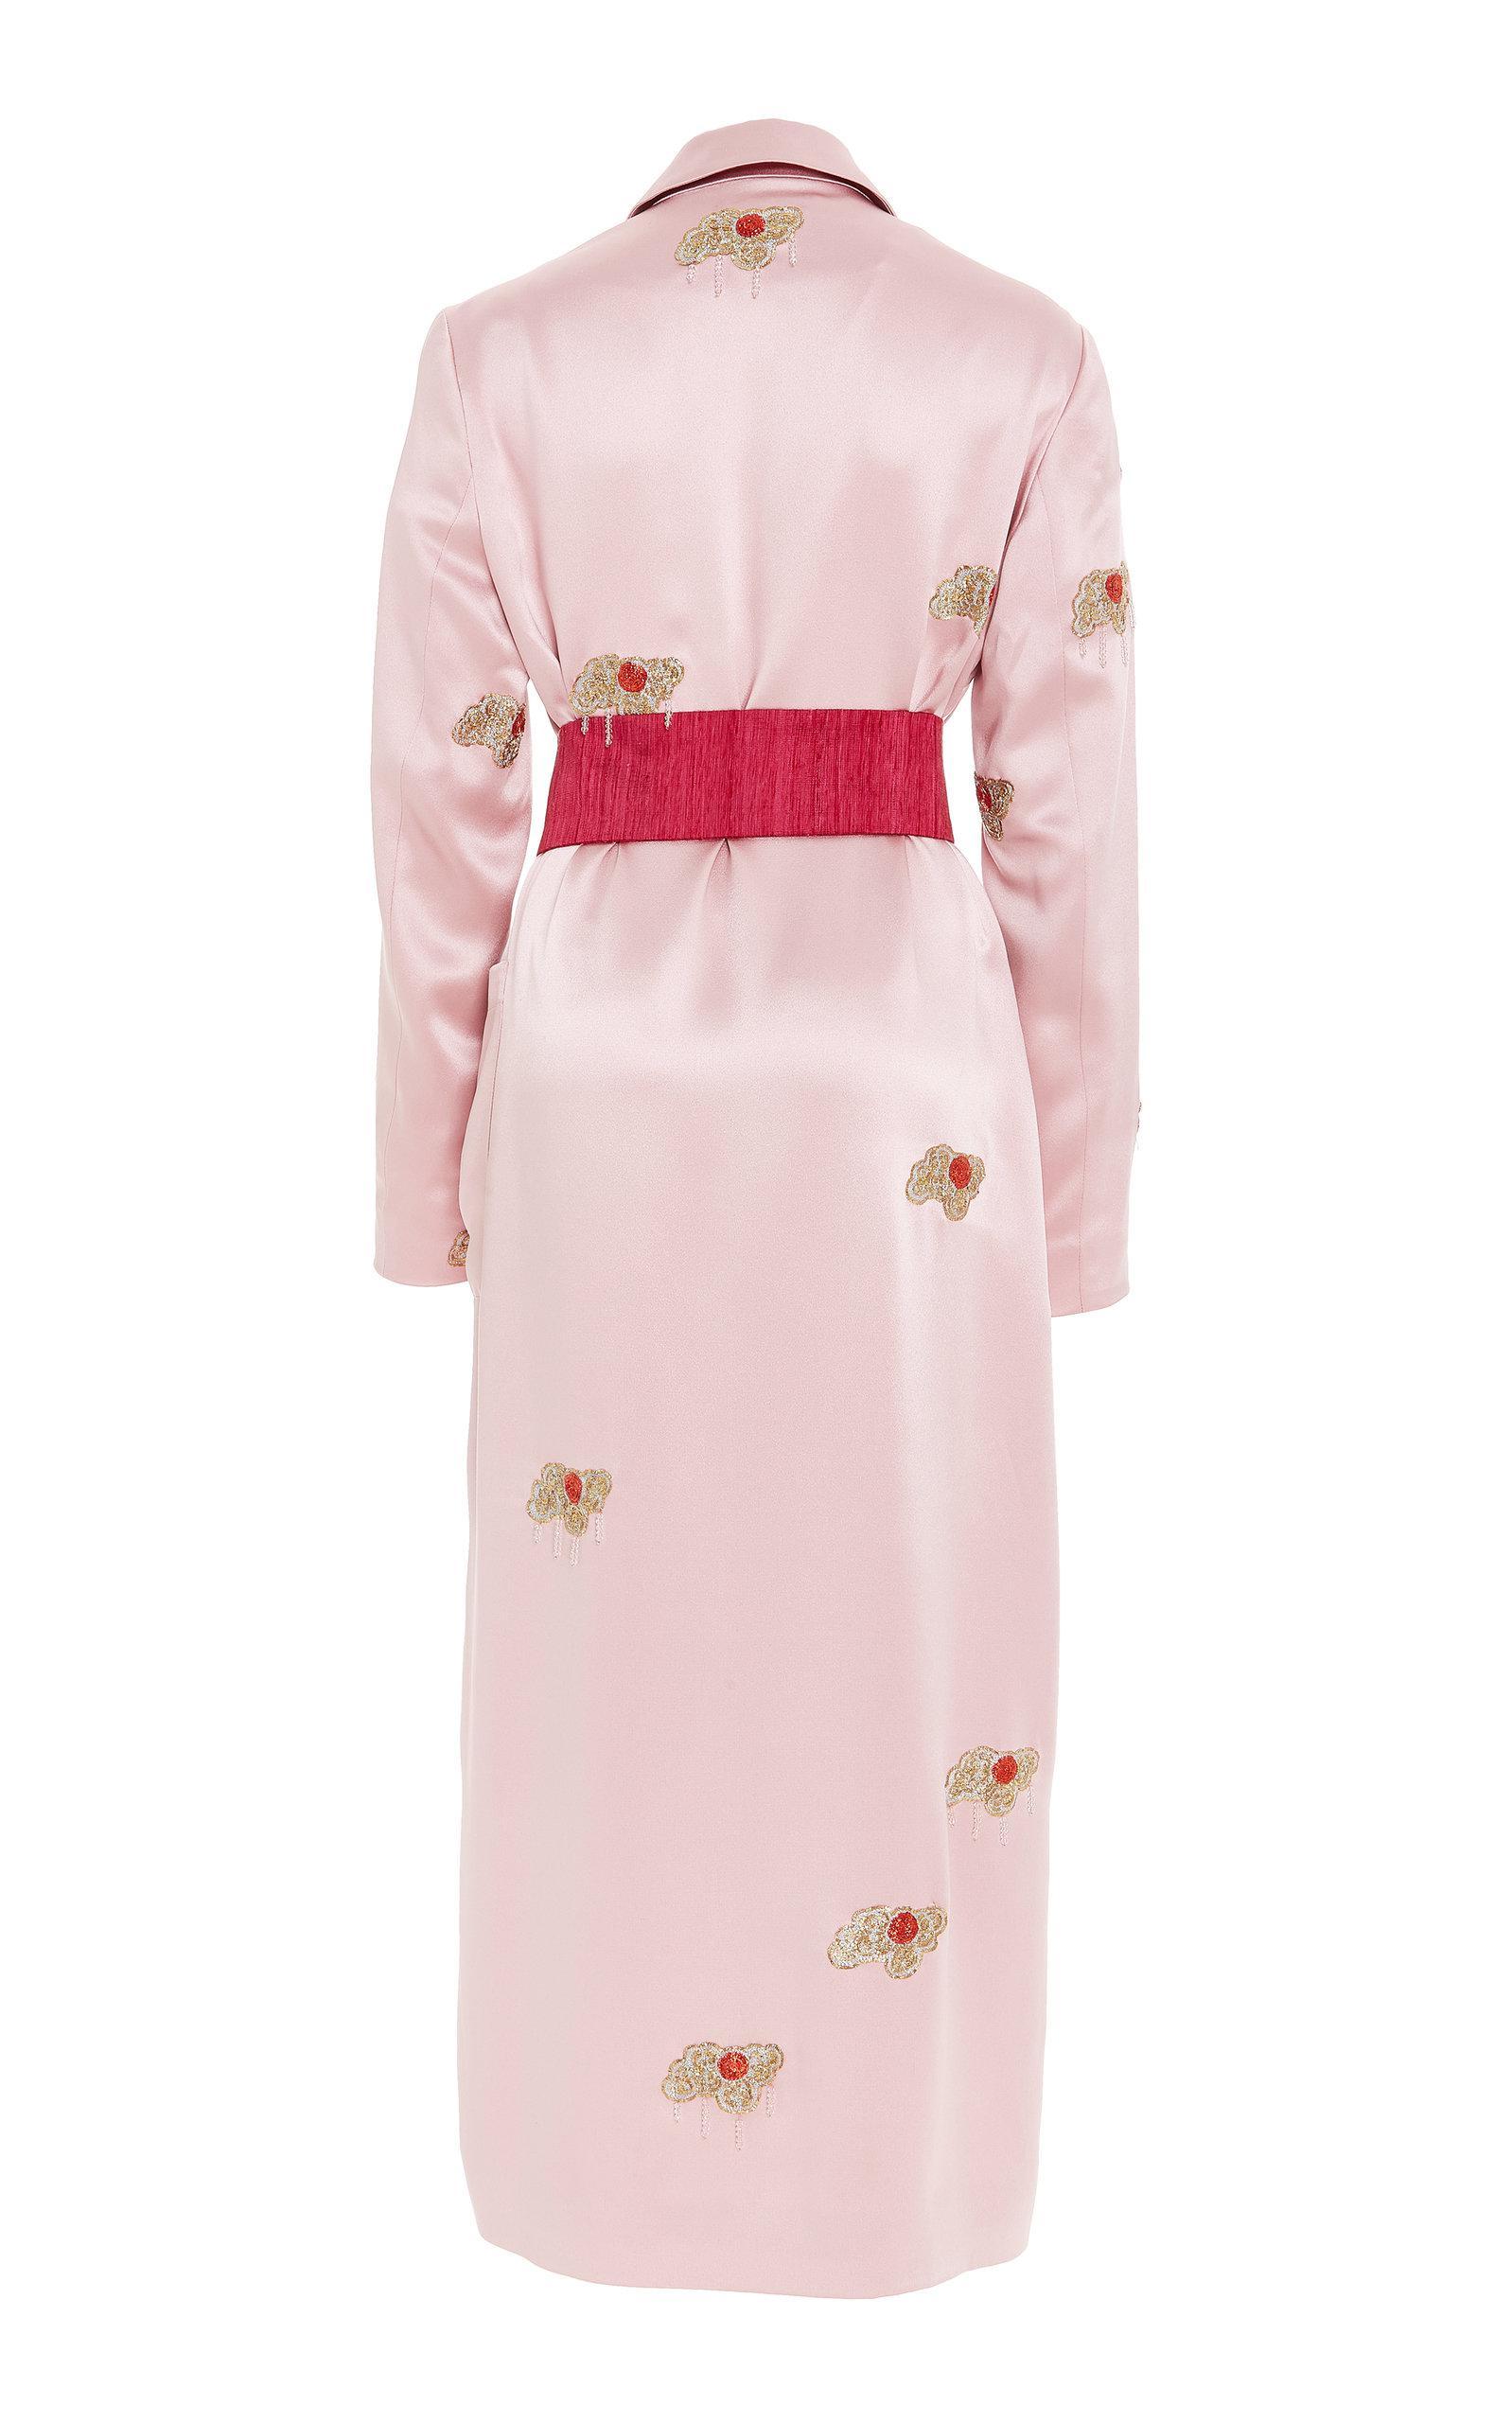 Satin Embroidered Coat Dress Markarian R4Bls